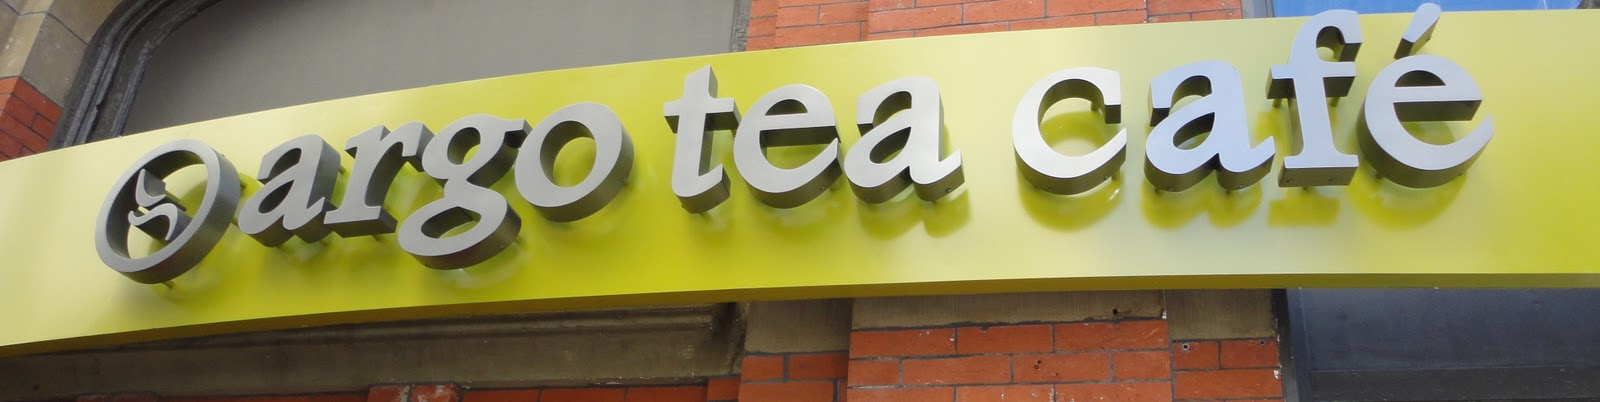 Argo Tea Cafe Flatiron Building New York Ny